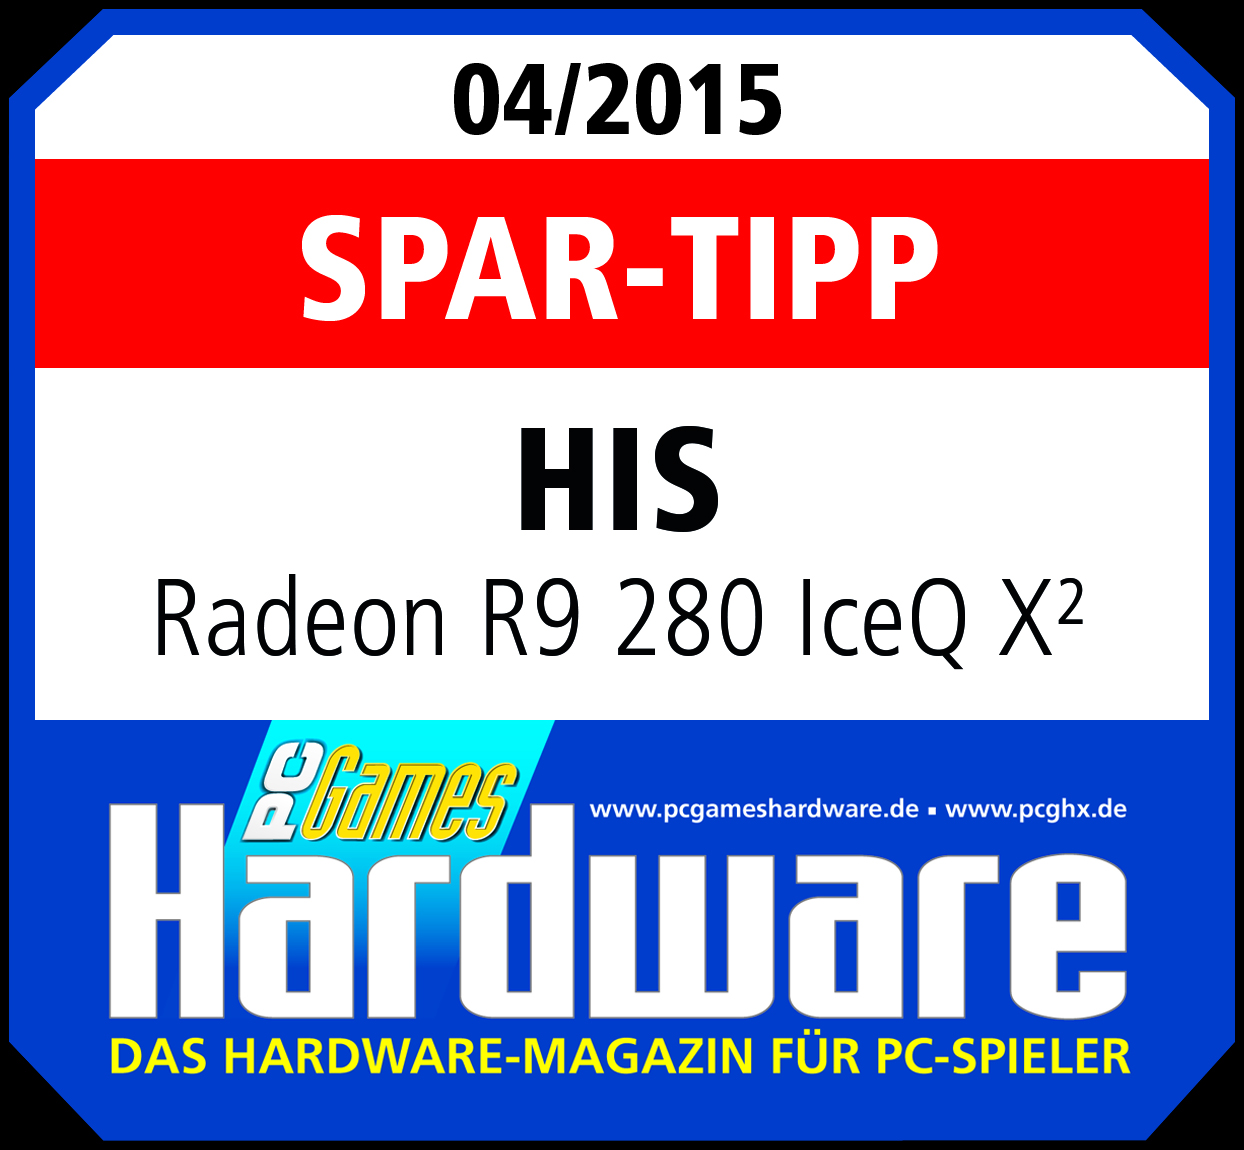 Spar-Tipp